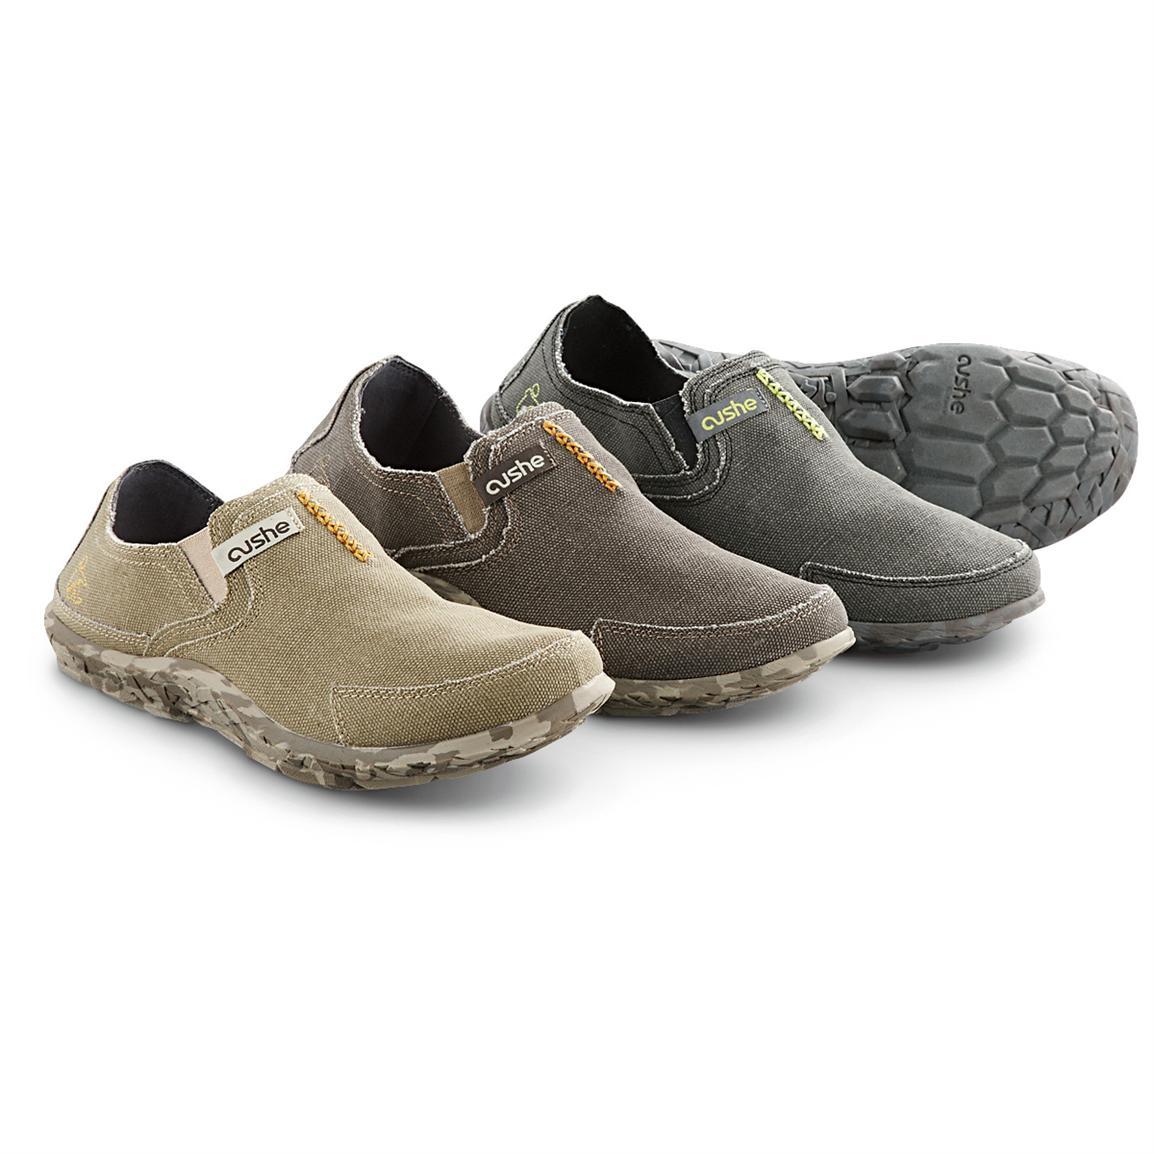 cushe shoes cushe menu0027s slipper shoes, sand / brown / black PJAIQBQ